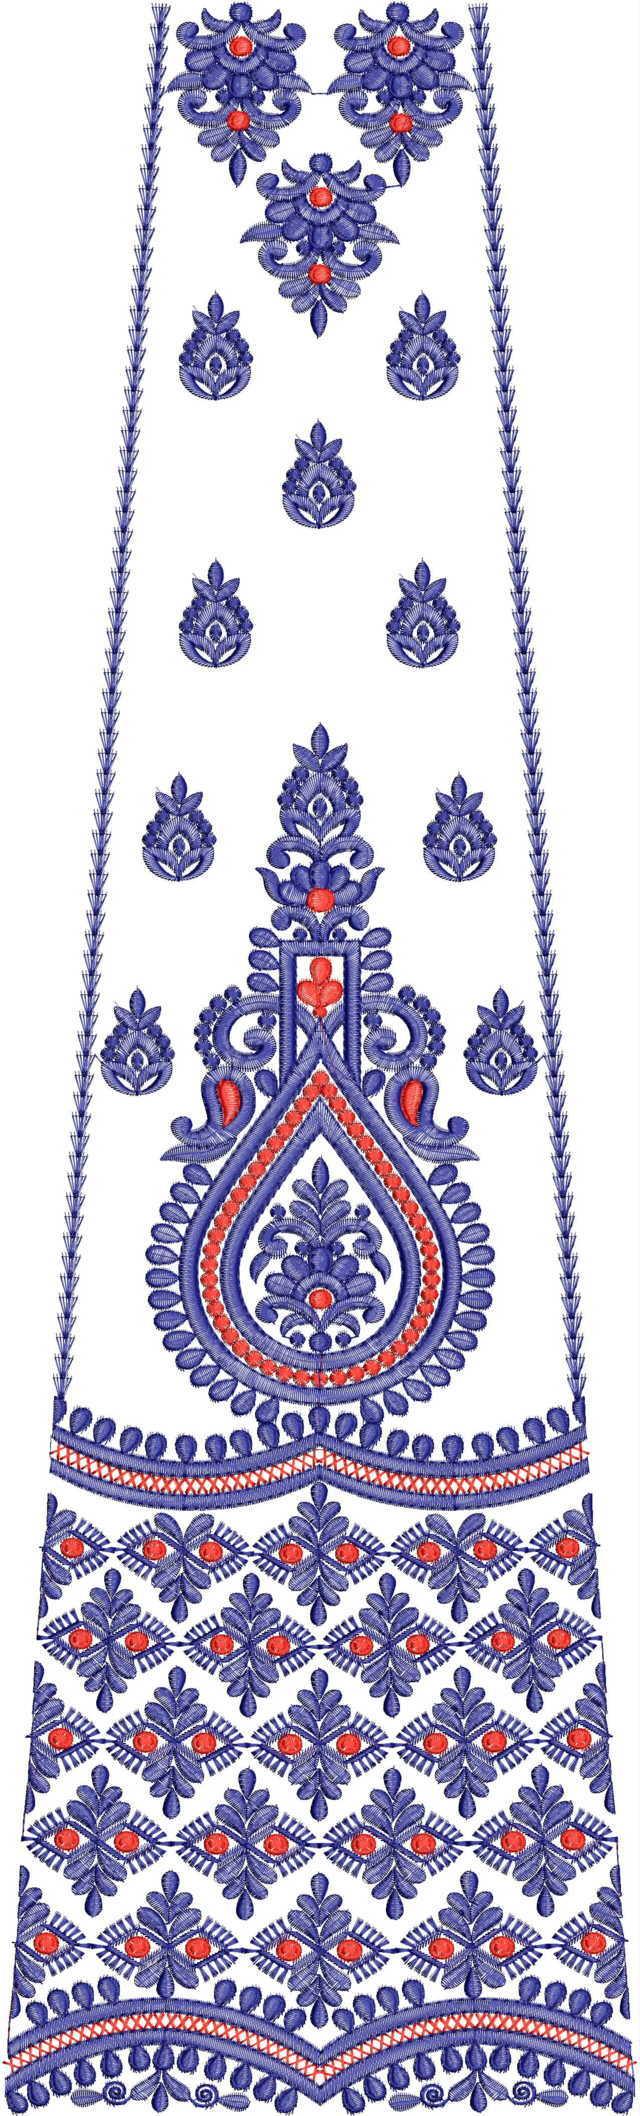 tedeex_design_chn_lehenga-chain-stitch